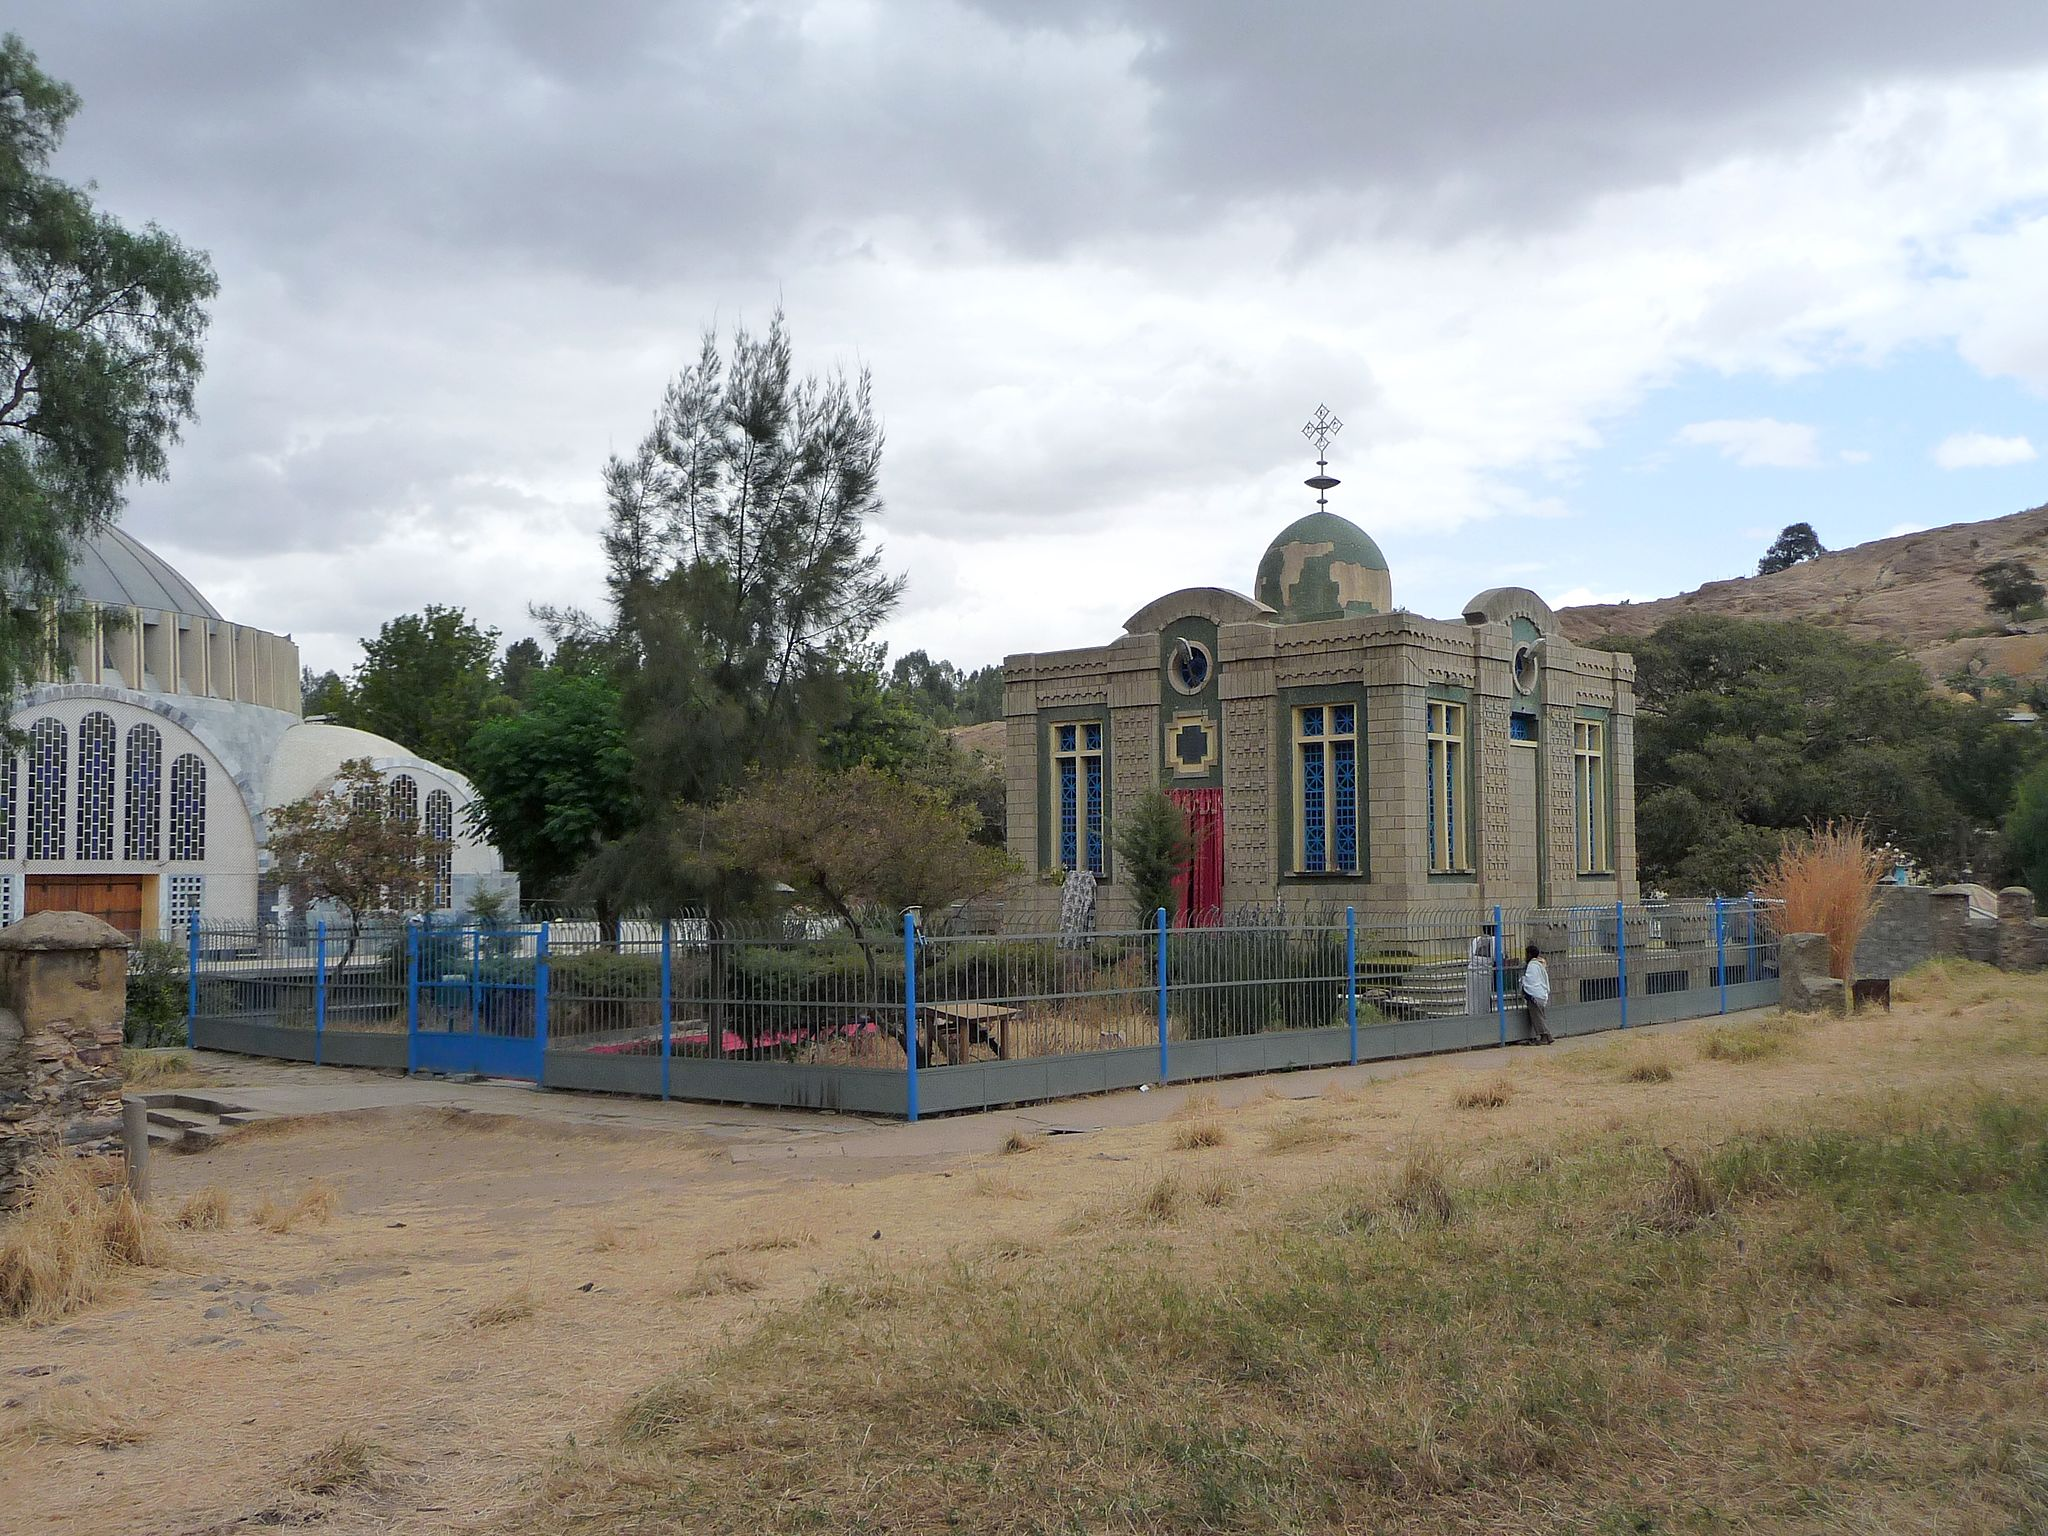 Axum, La cappella dell'Arca dell'Alleanza